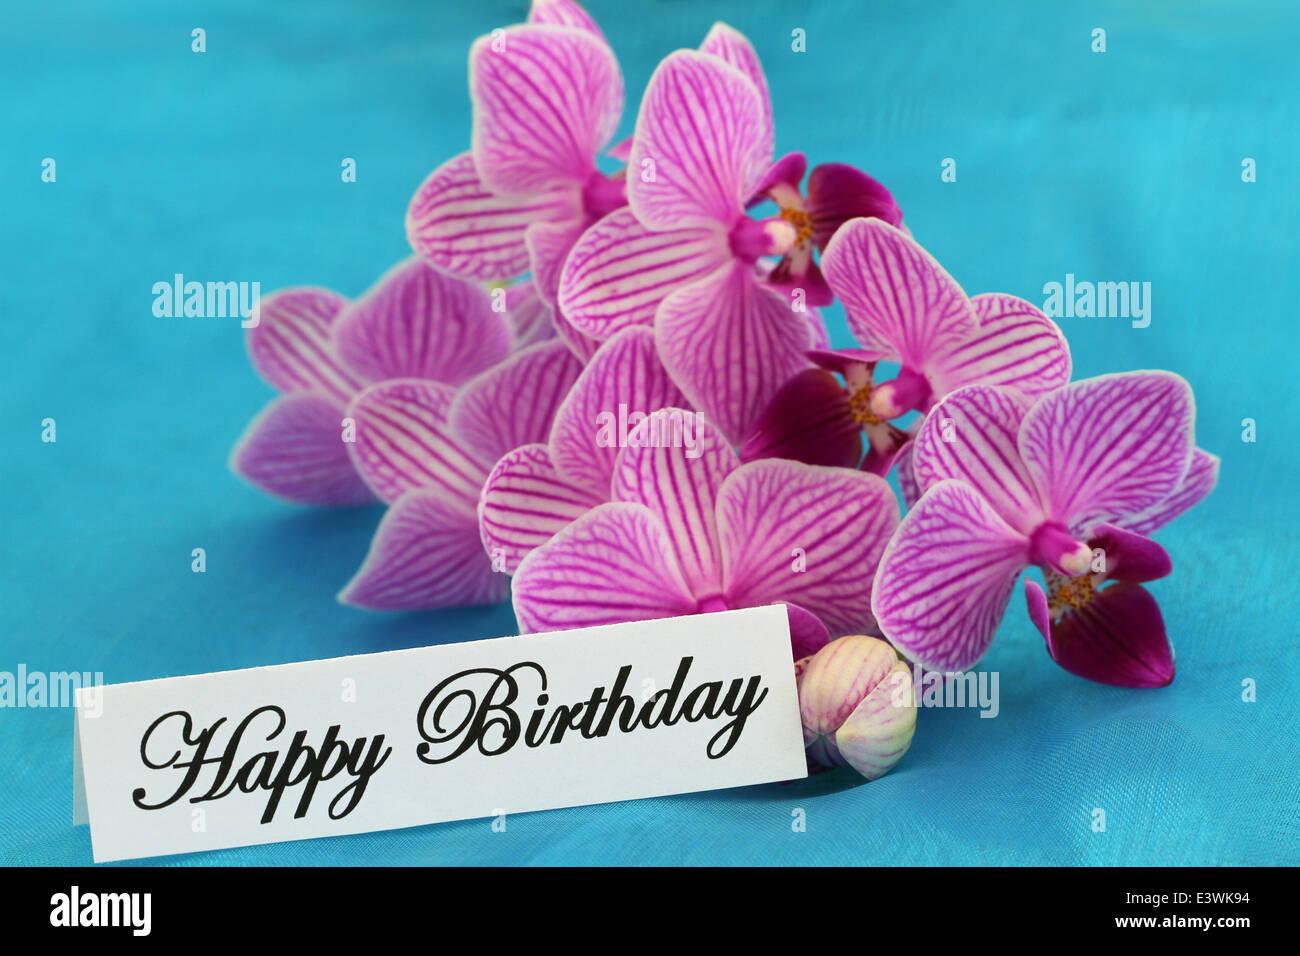 Happy birthday card pink orchid stock photos happy birthday card happy birthday card with pink orchids stock image izmirmasajfo